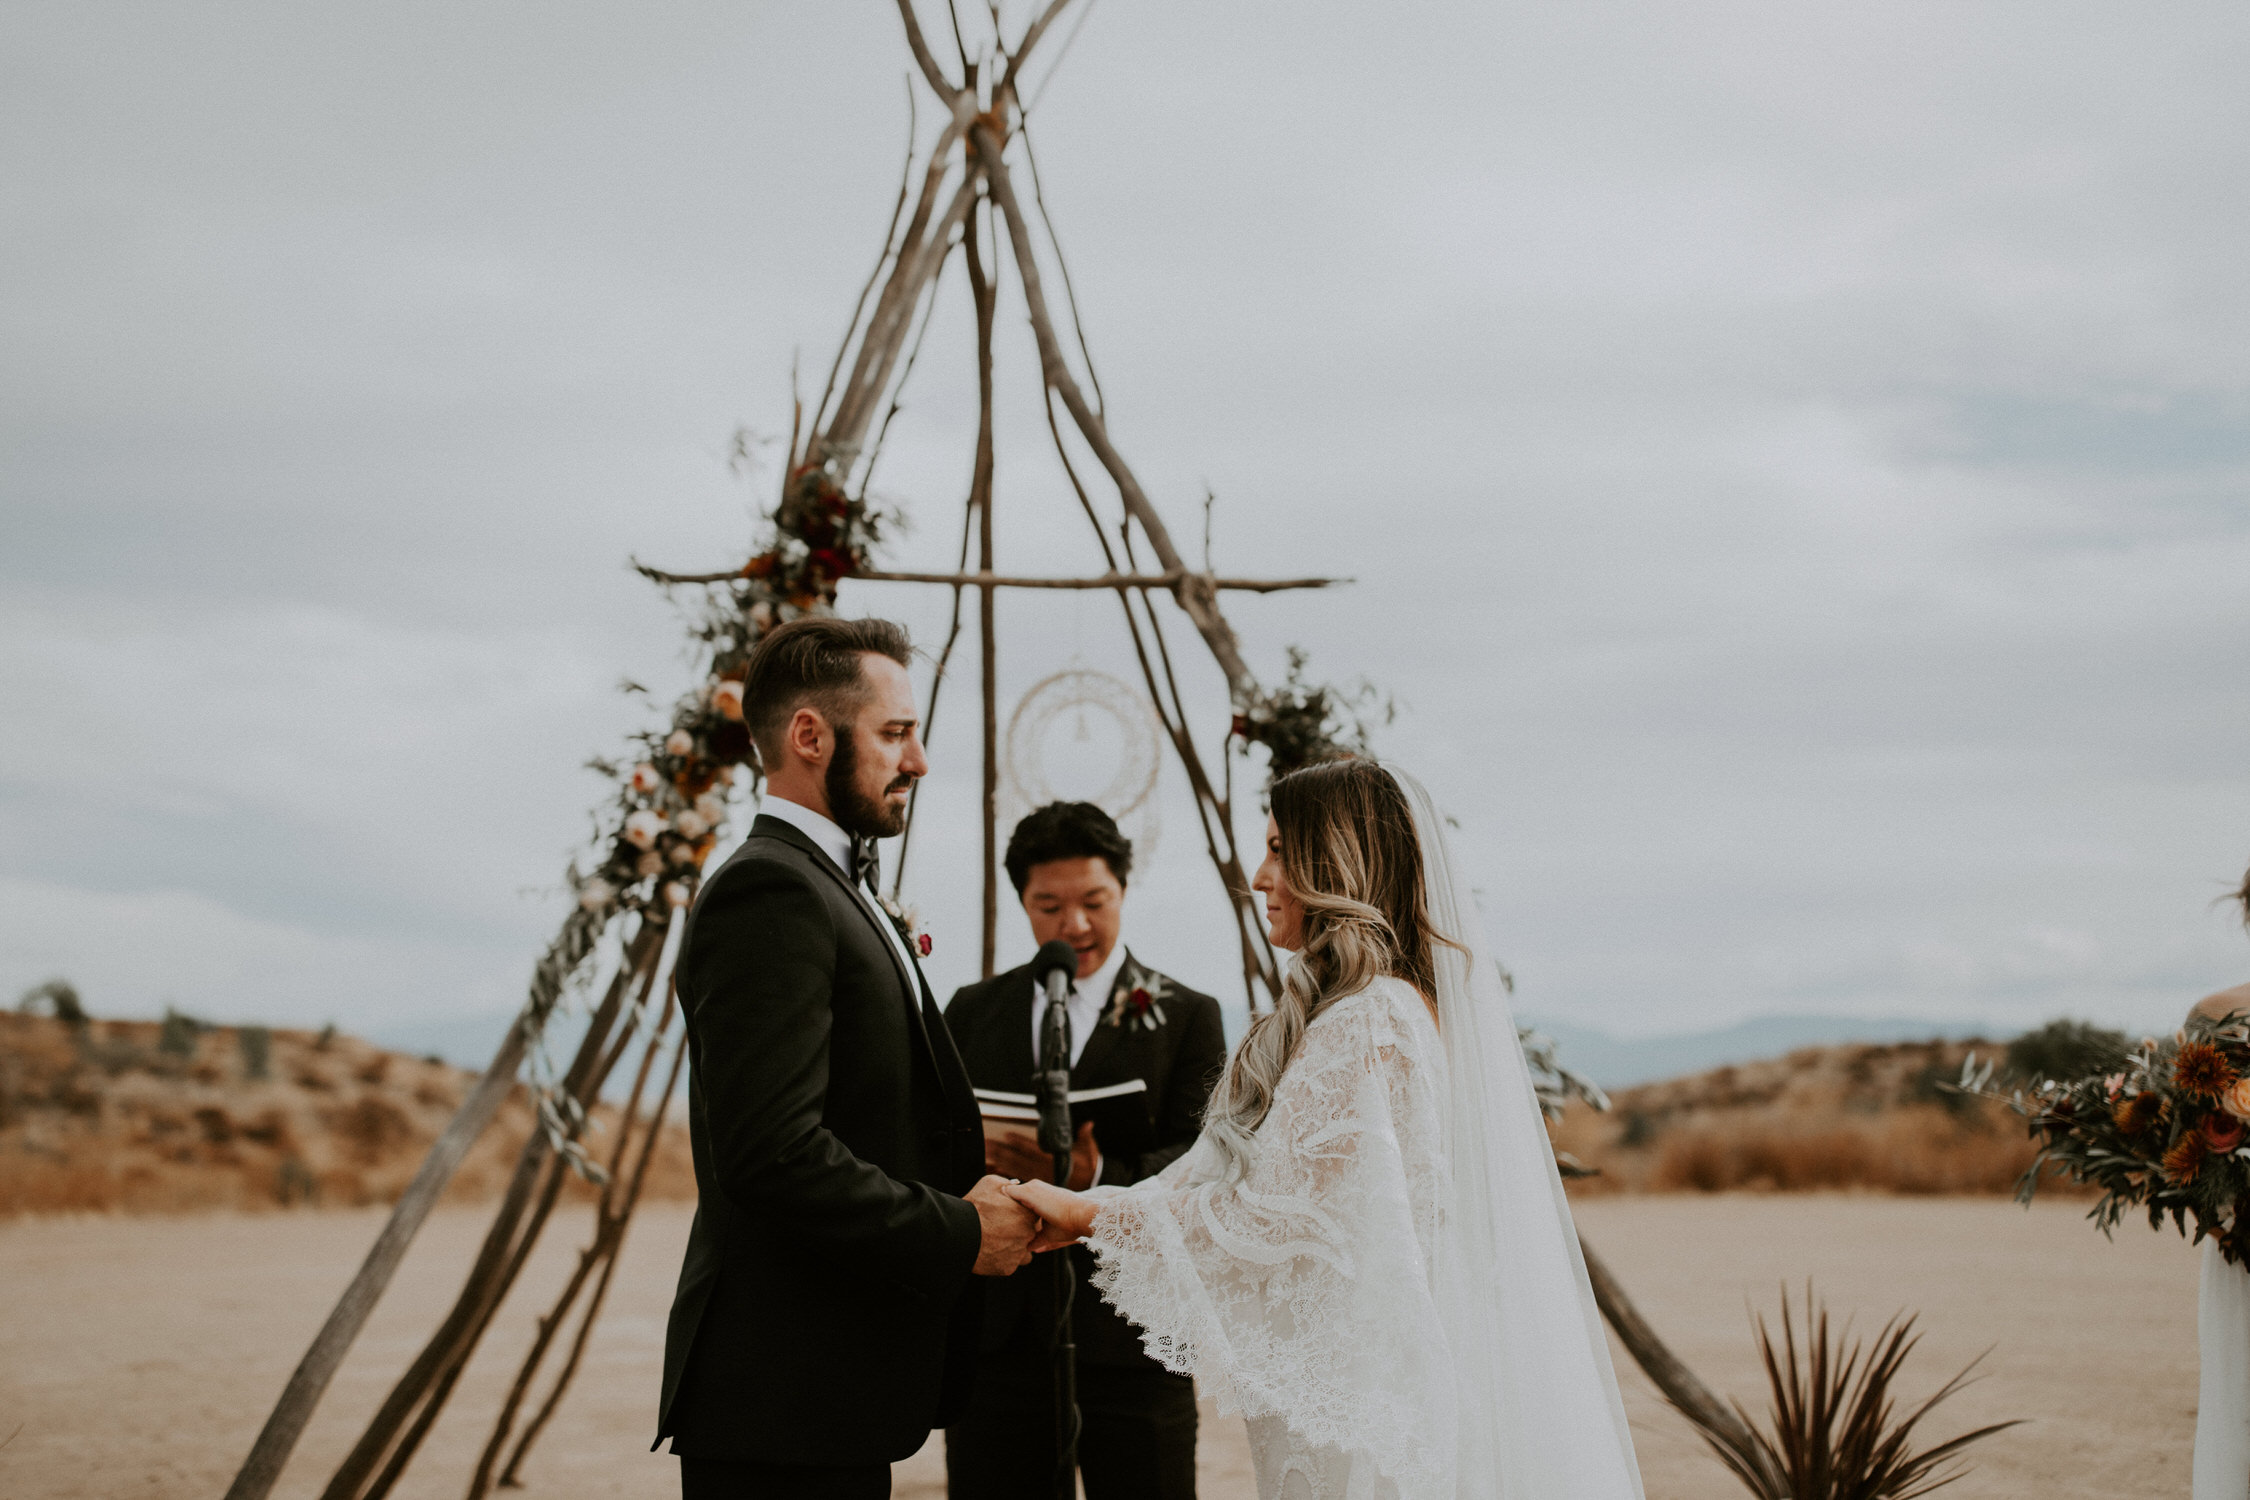 couple-intimate-wedding-temecula-488.jpg